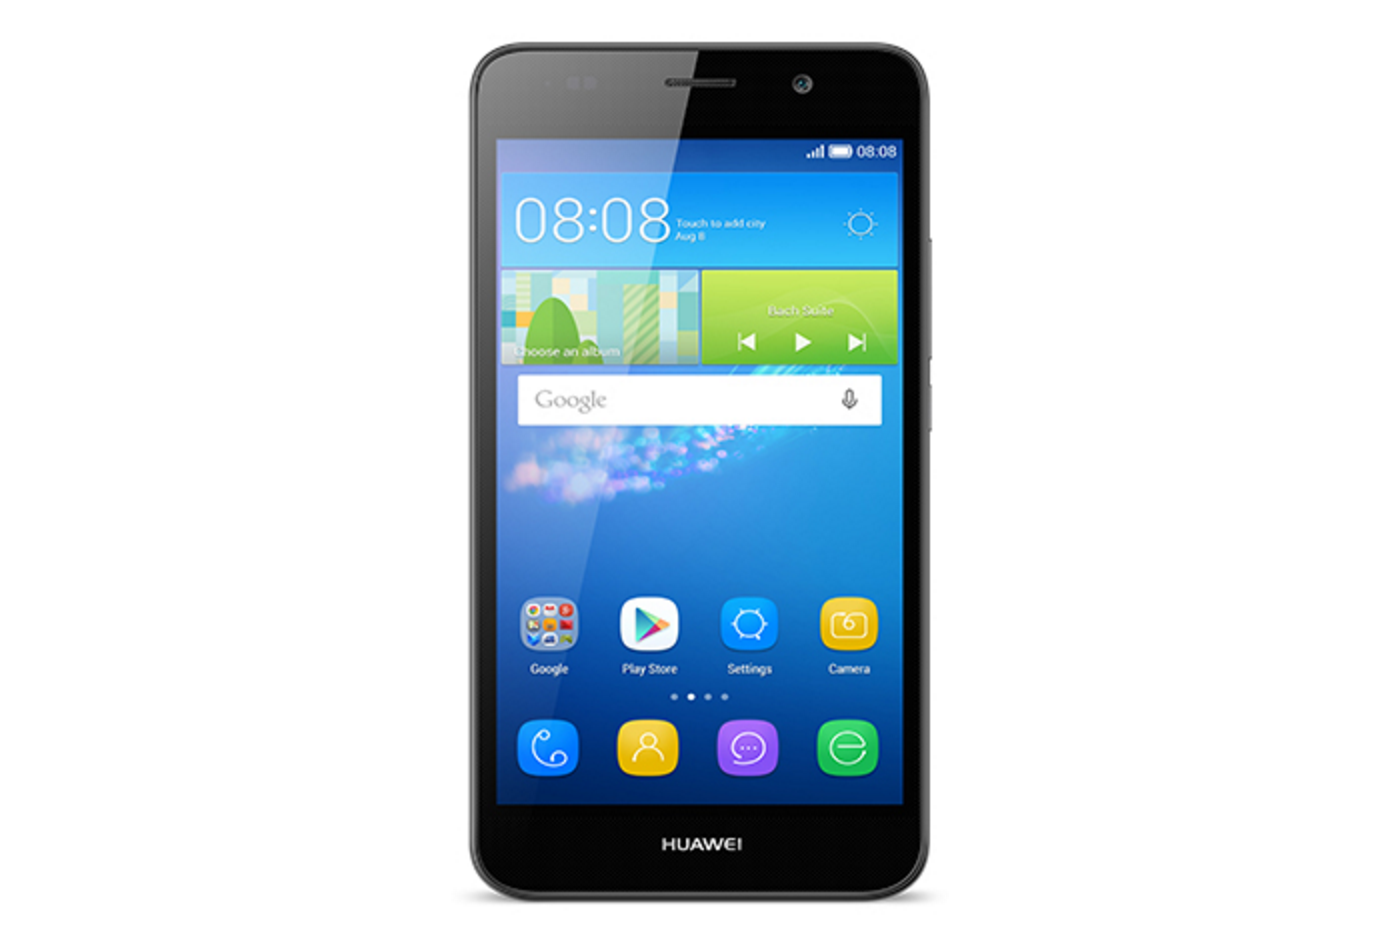 HUAWEI(ファーウェイ)の格安スマホ「HUAWEI Y6」の価格や性能、スペックやZenFone Goとの比較